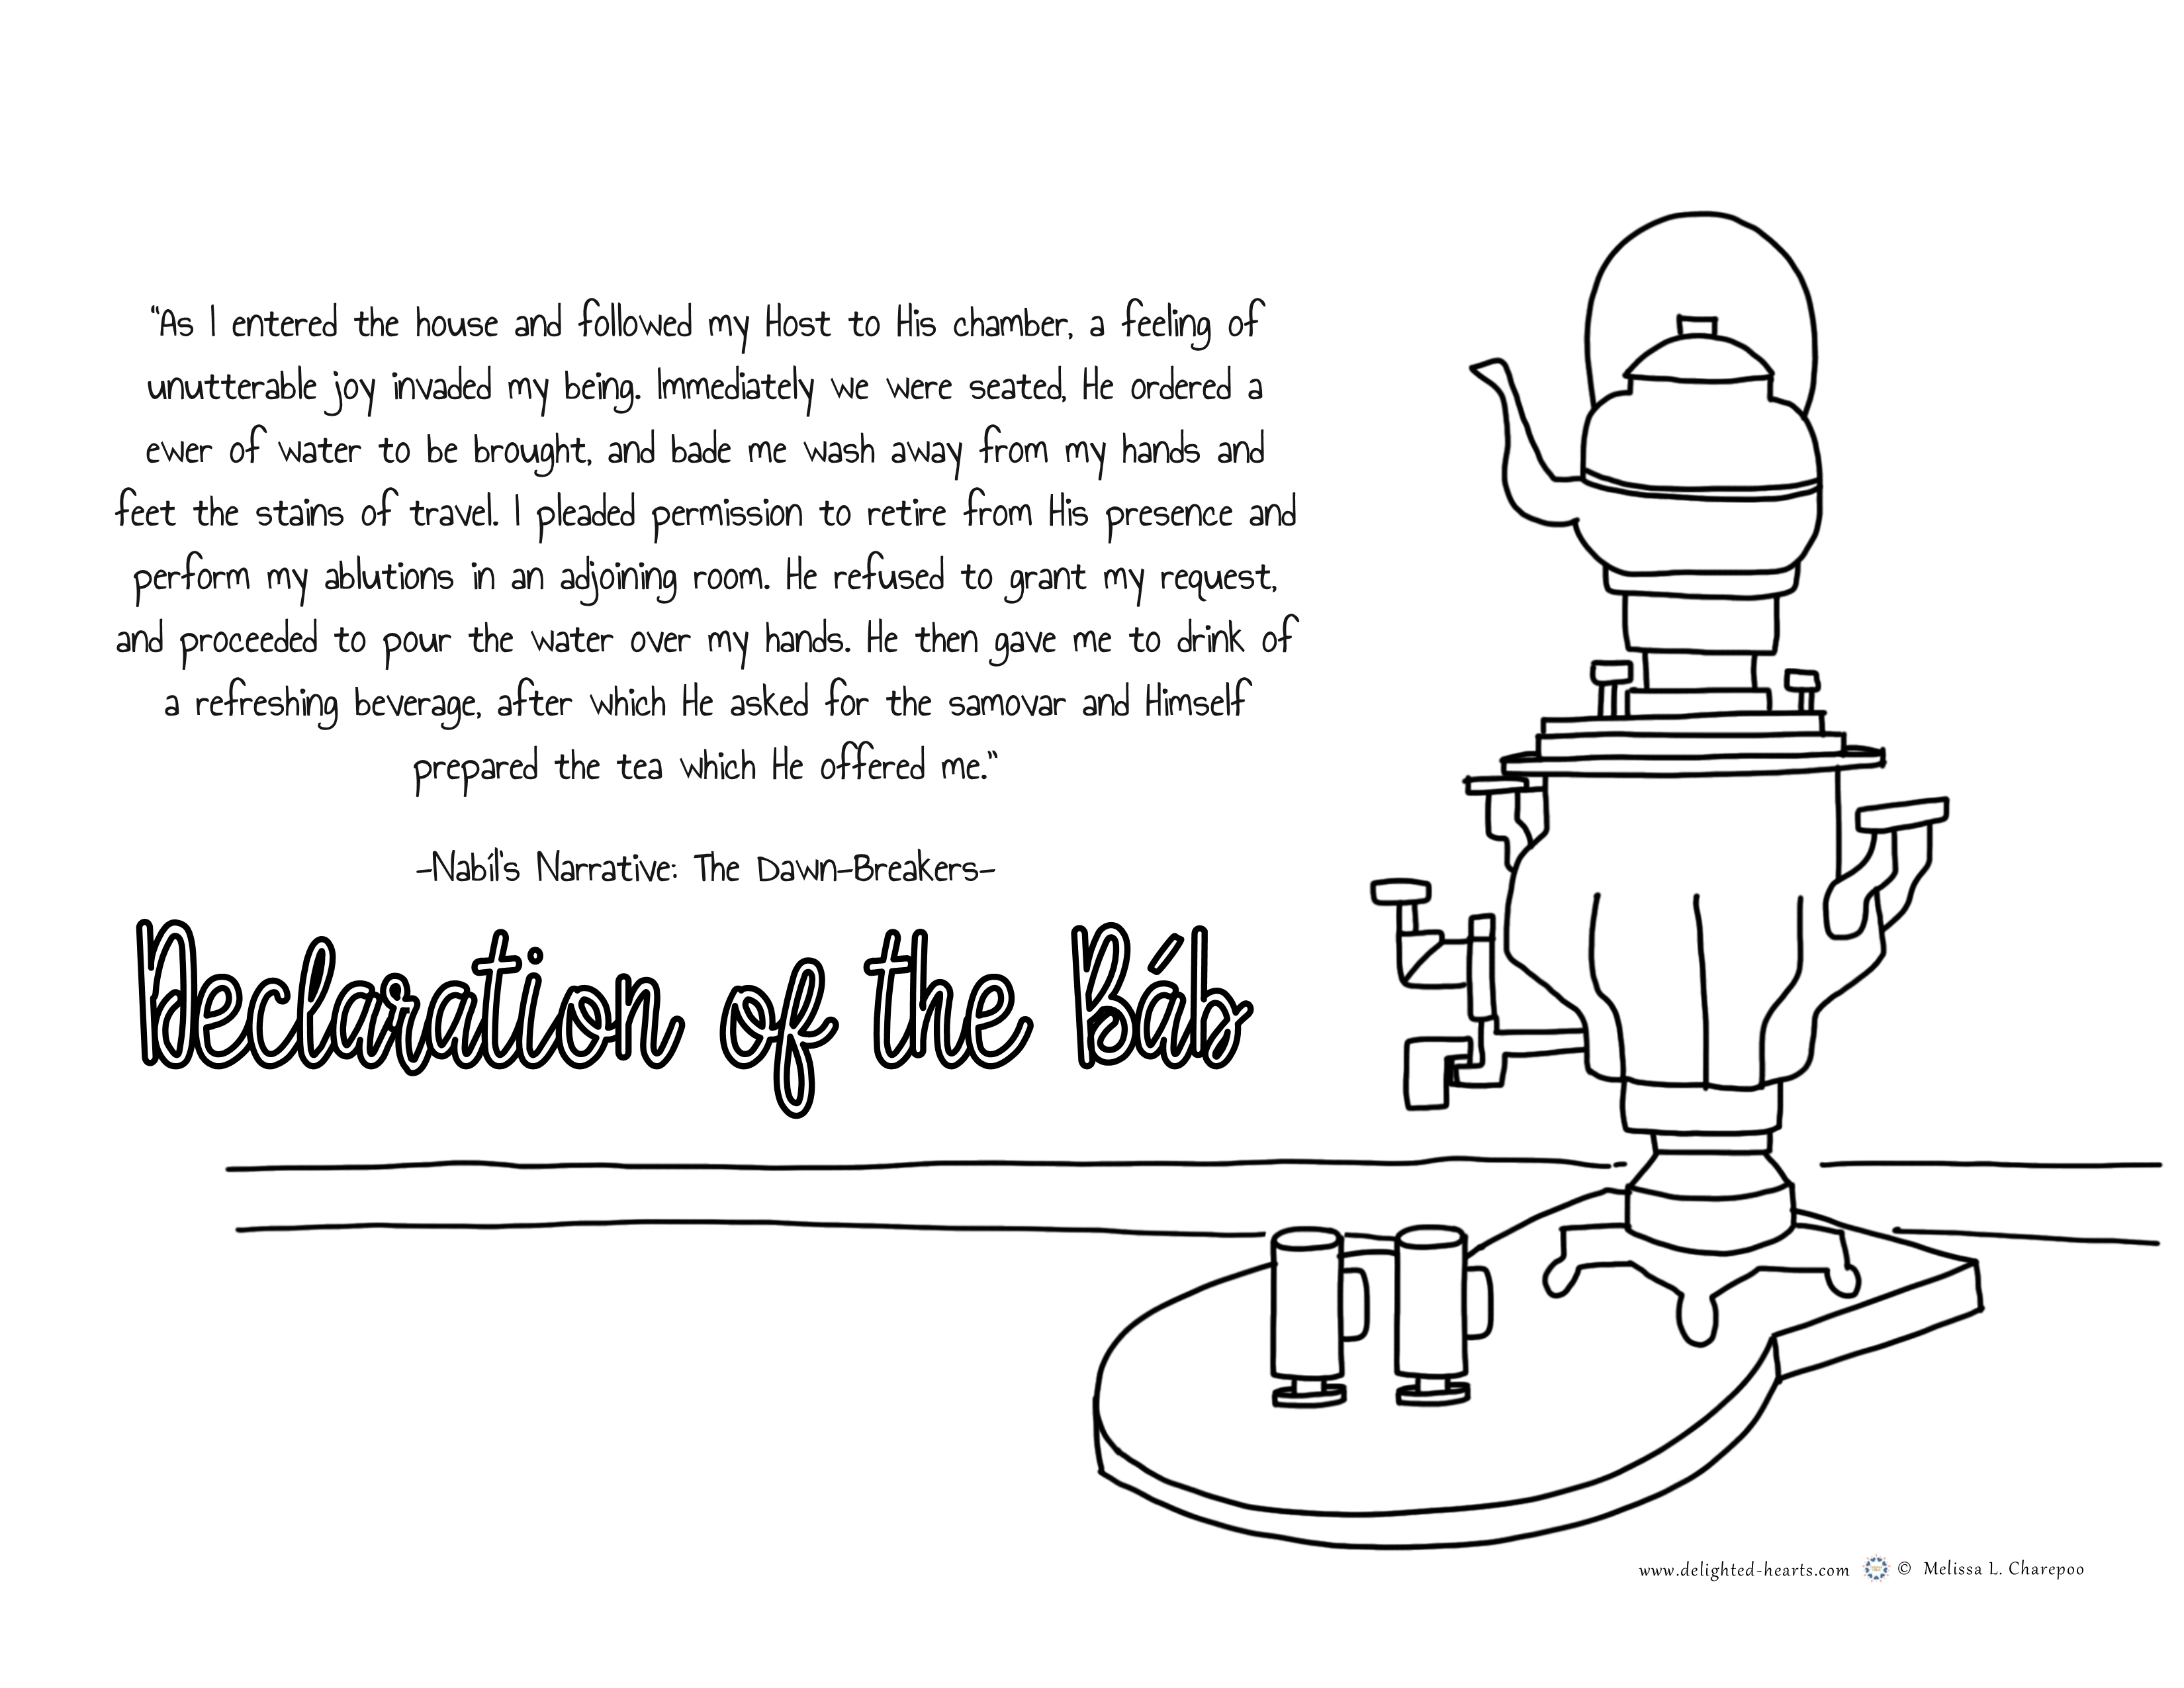 Declaration of the Bab_176_DHLLC_Melissa Charepoo_ Declaration of the Bab